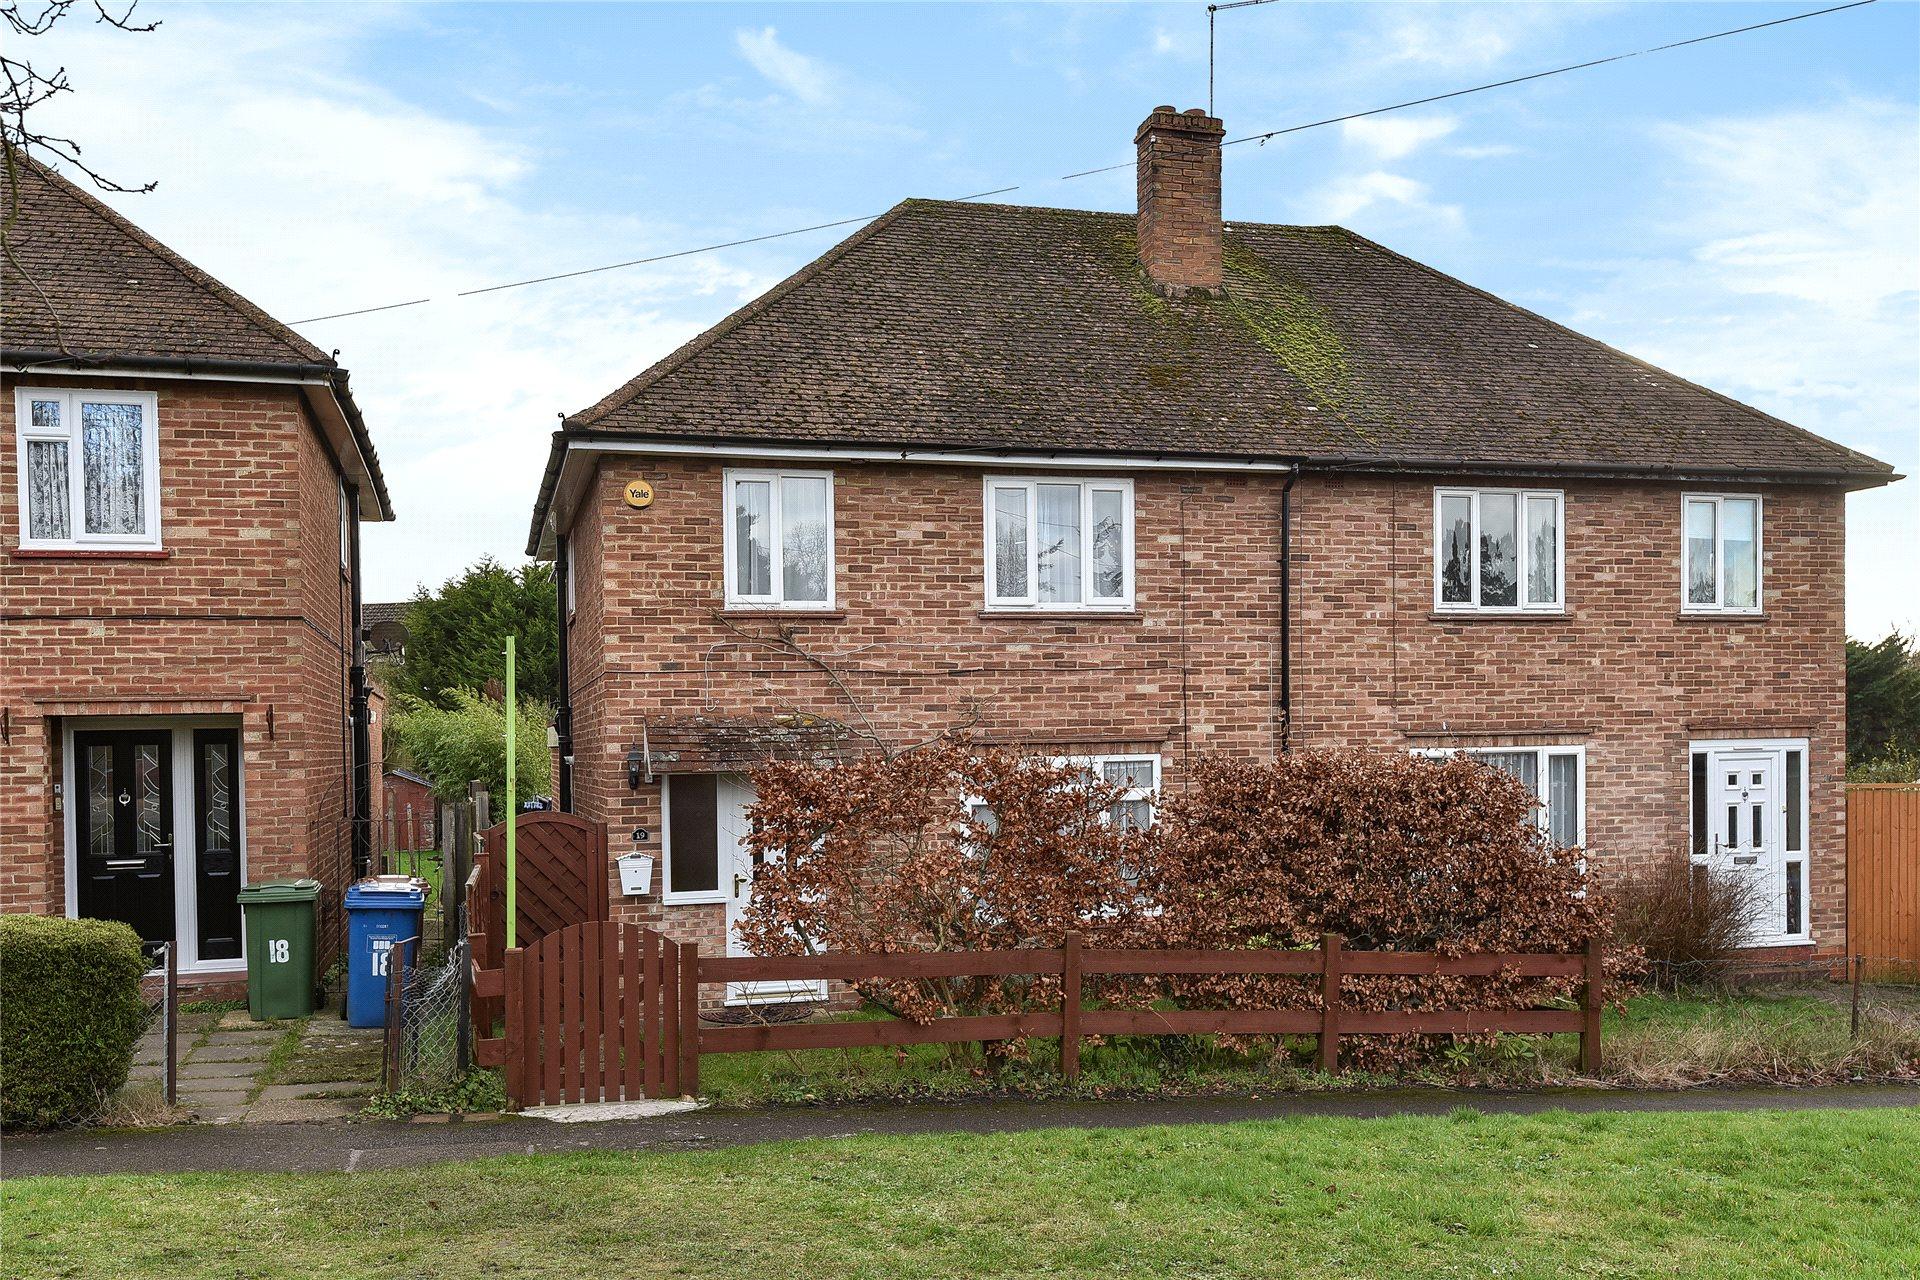 3 Bedrooms Semi Detached House for sale in Wellington Close, Sandhurst, Berkshire, GU47